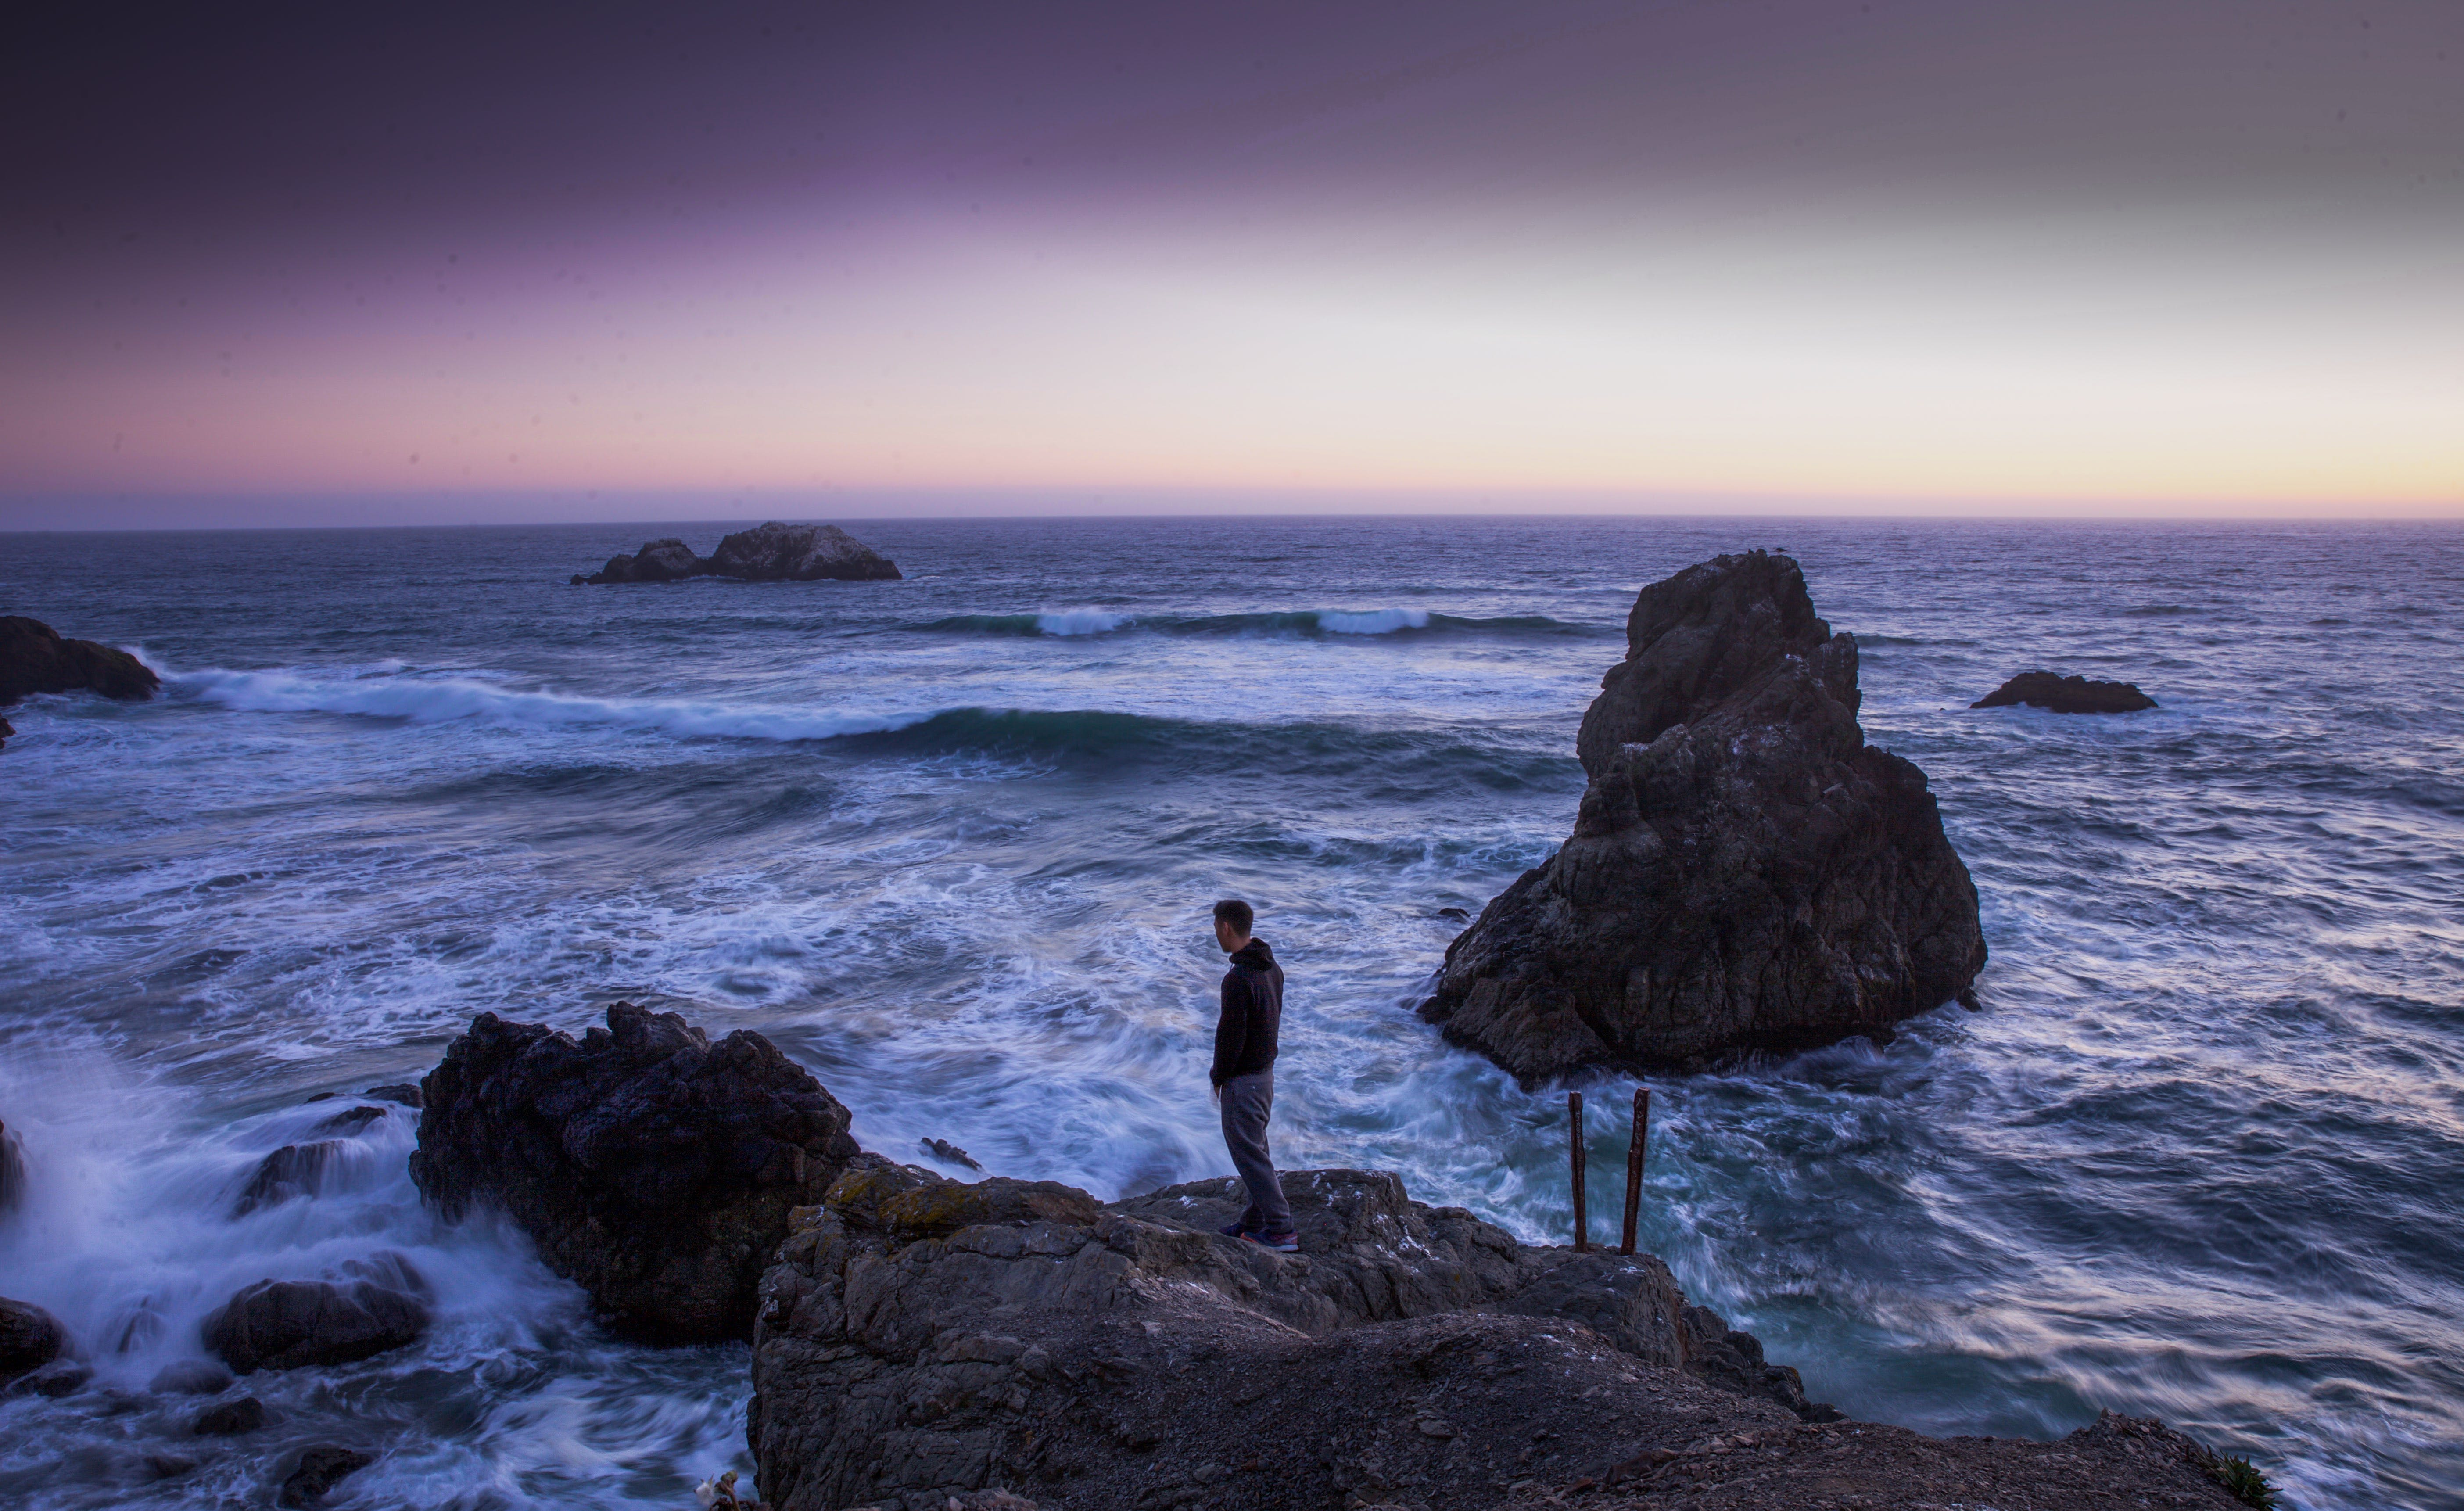 Man in Black Shirt Standing on Rock in Between Sea Water